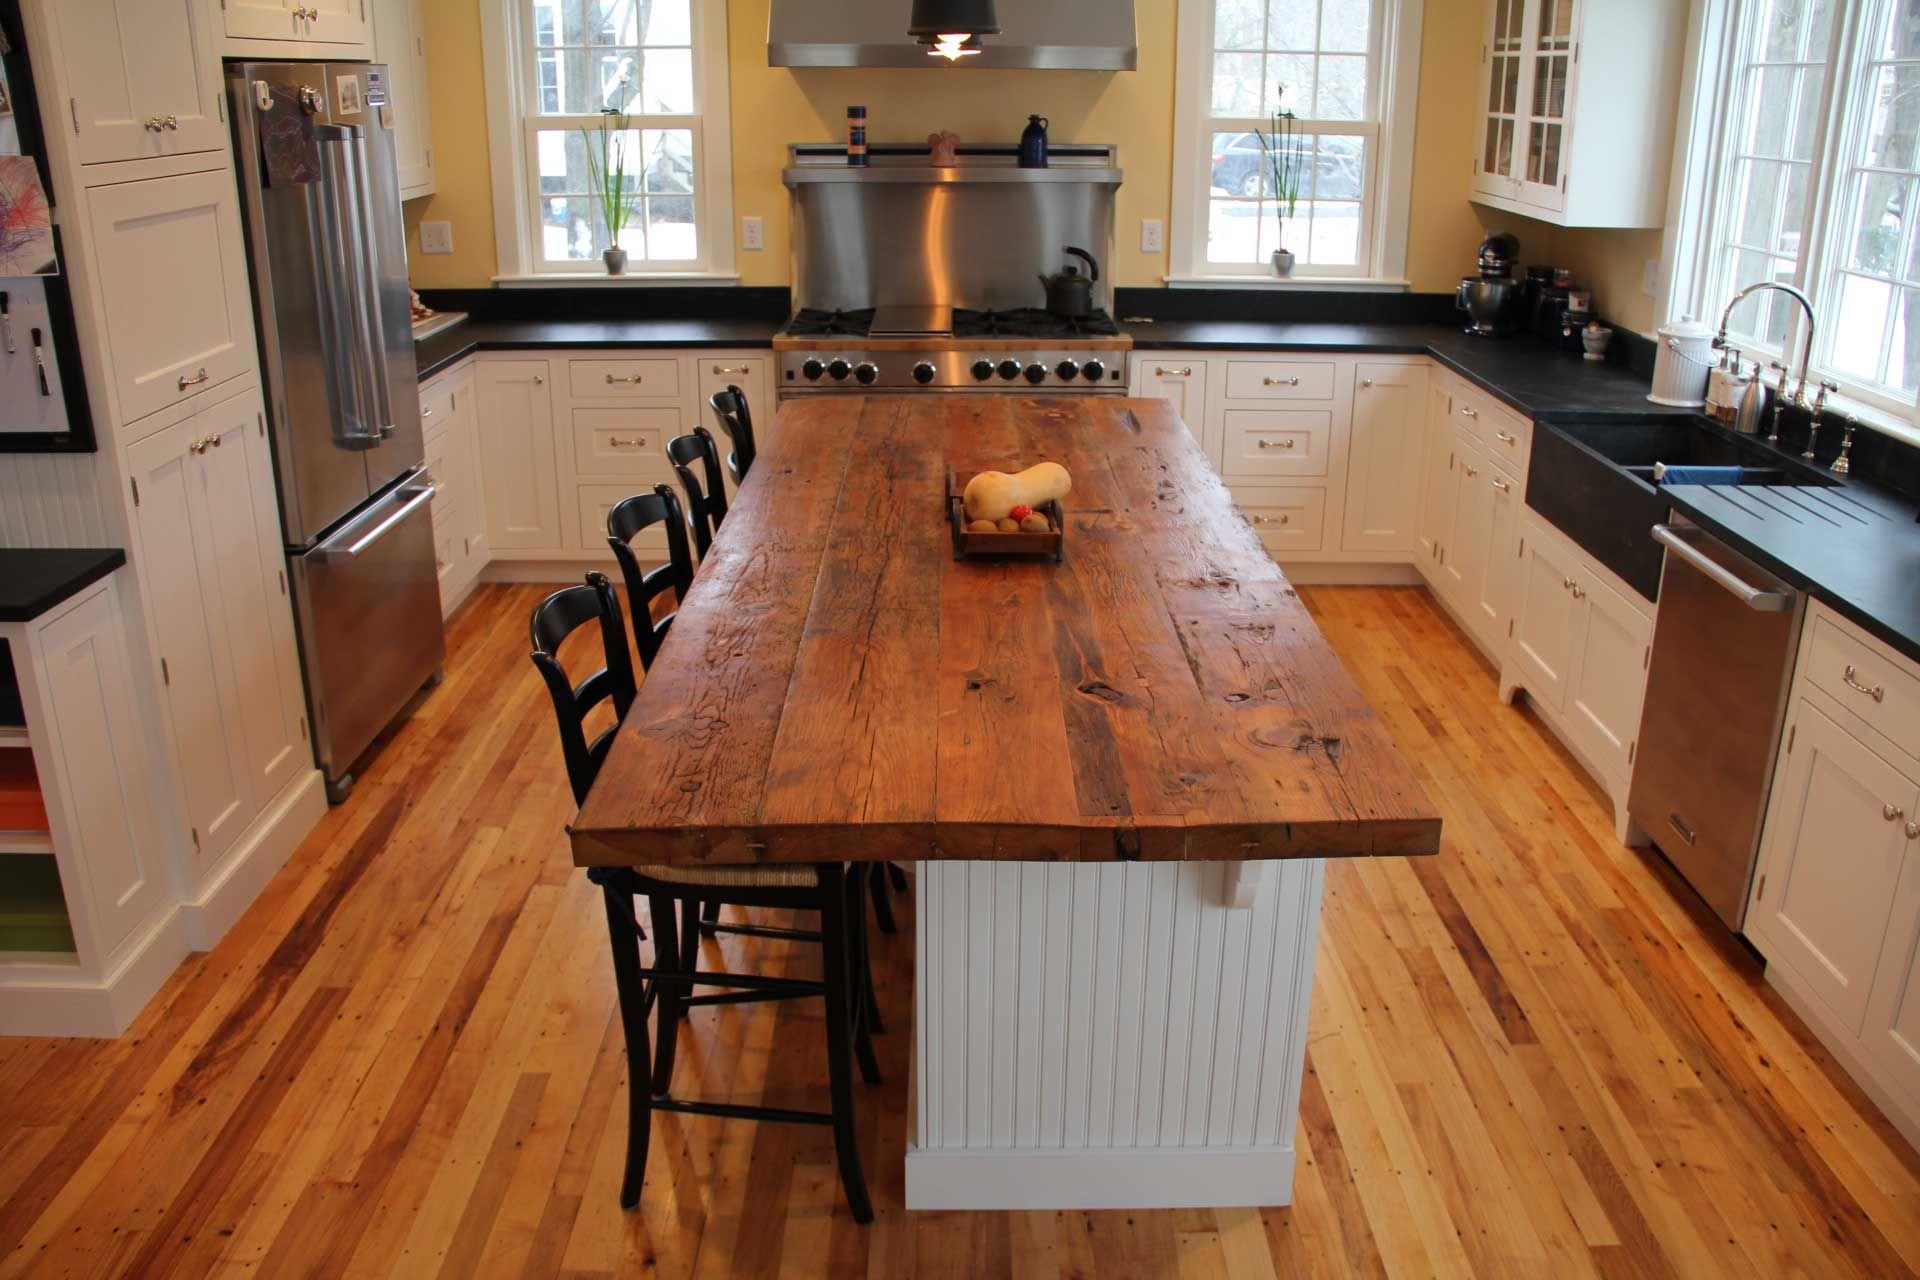 Longleaf Lumber reclaimed rustic white pine counter top